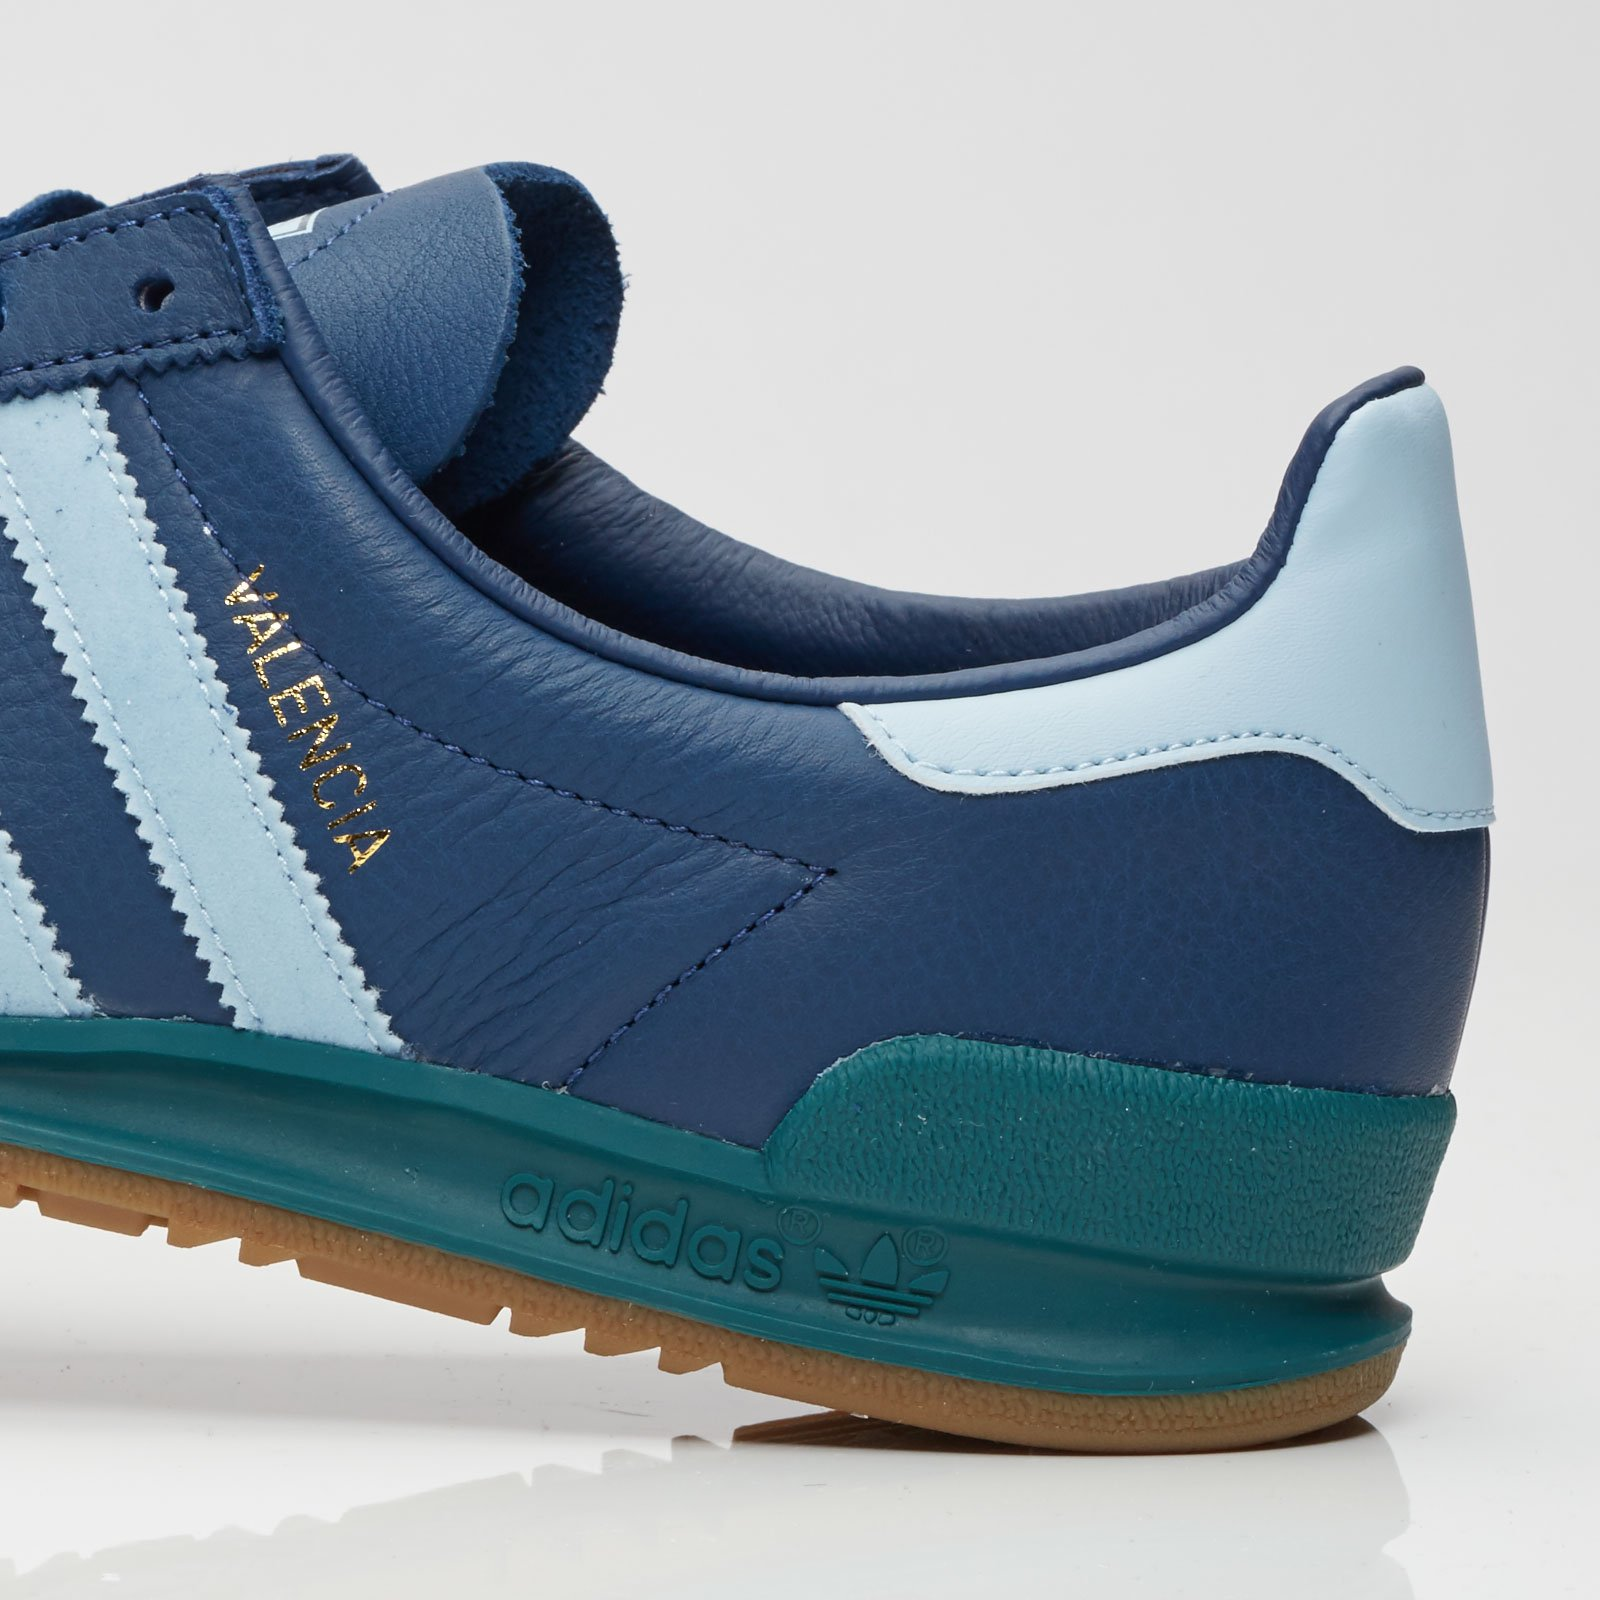 Anoi Gracioso Confiar  adidas Jeans City Series - Bb5274 - Sneakersnstuff | sneakers & streetwear  online since 1999